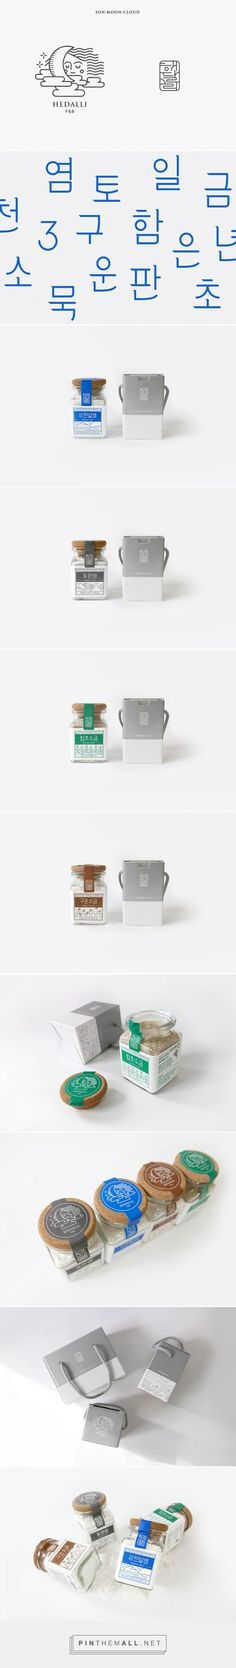 #Korean Hedali #Salt #packaging designed by Triangle Studio - http://www.packagingoftheworld.com/2015/10/hedali-salt.html: